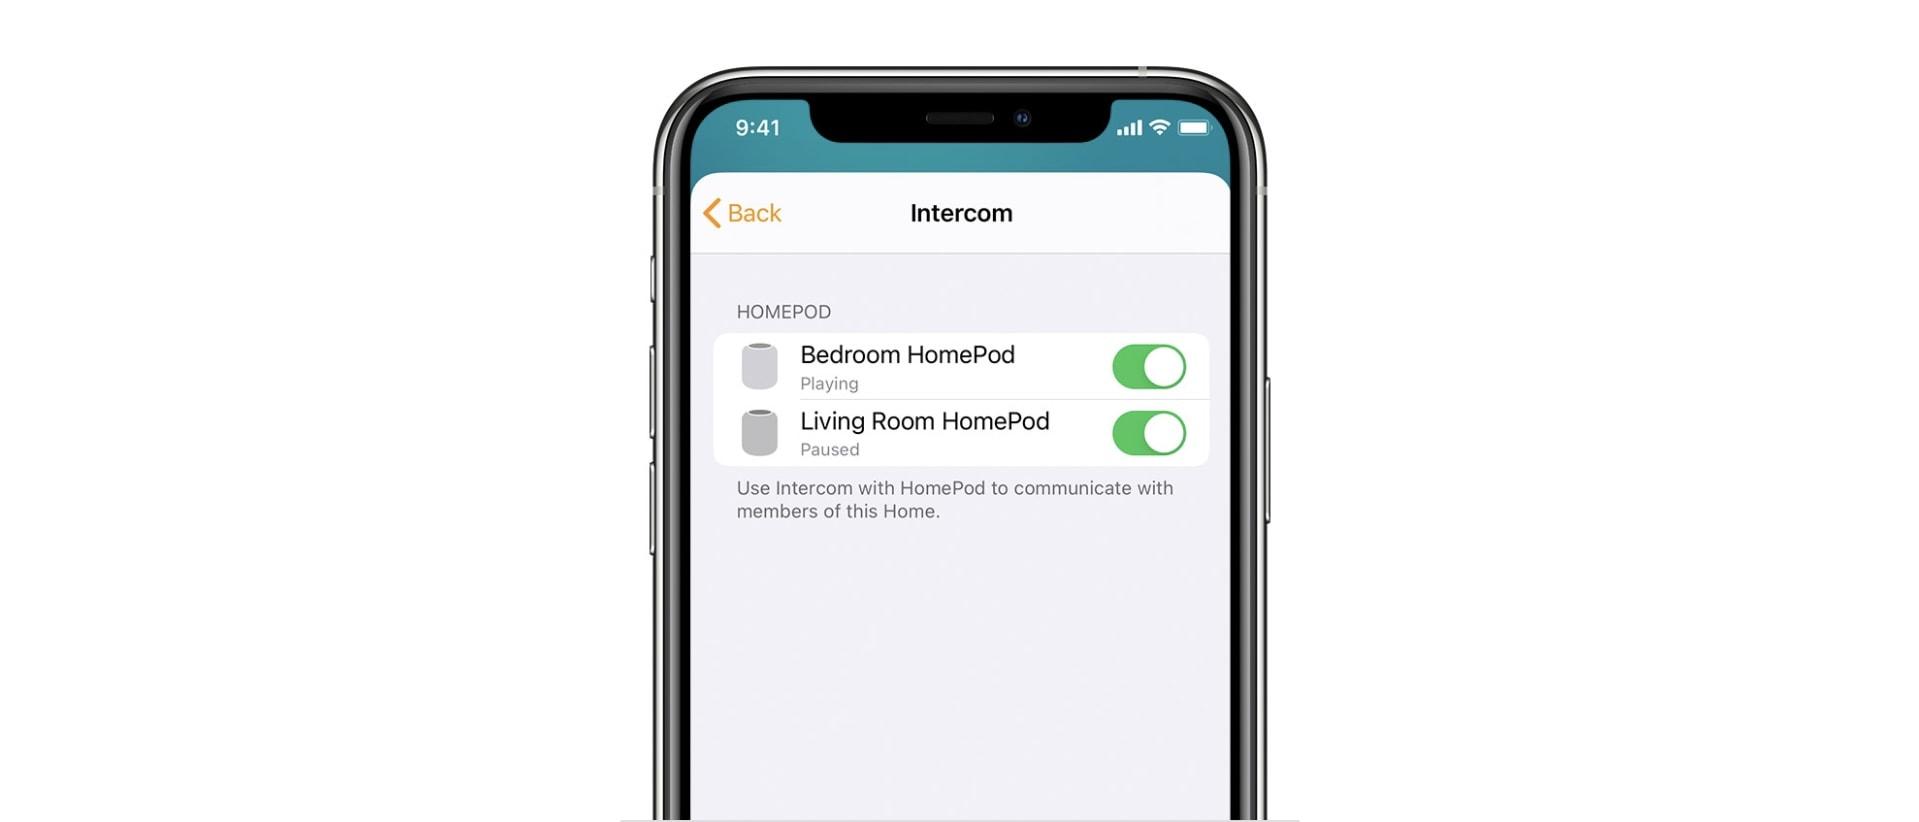 How to use Intercom